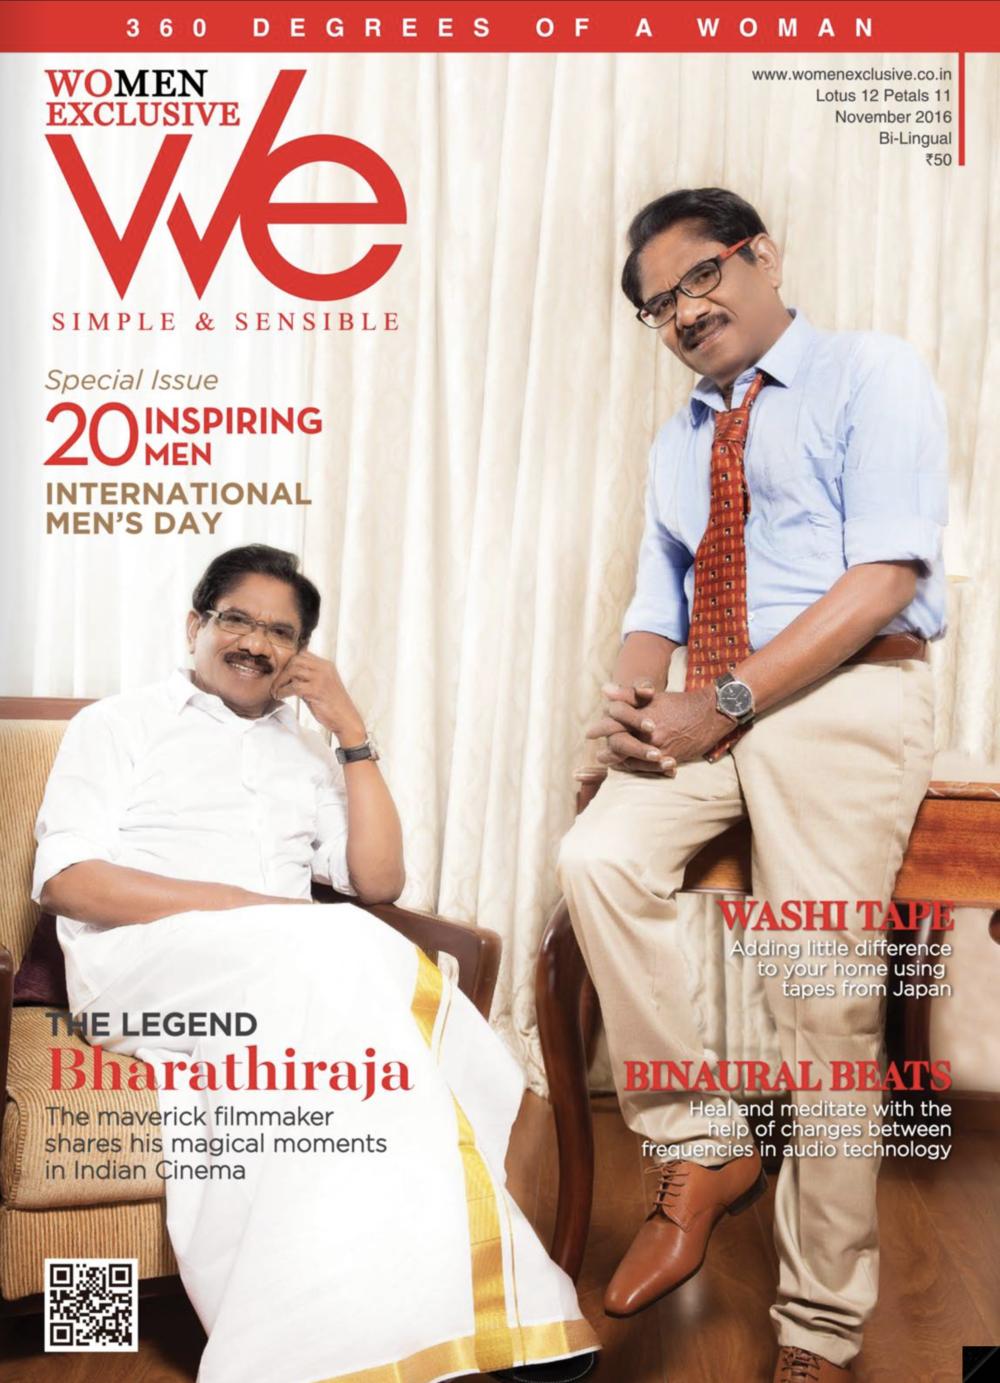 BHARATHIRAJA | Film Maker / Writer / Actor